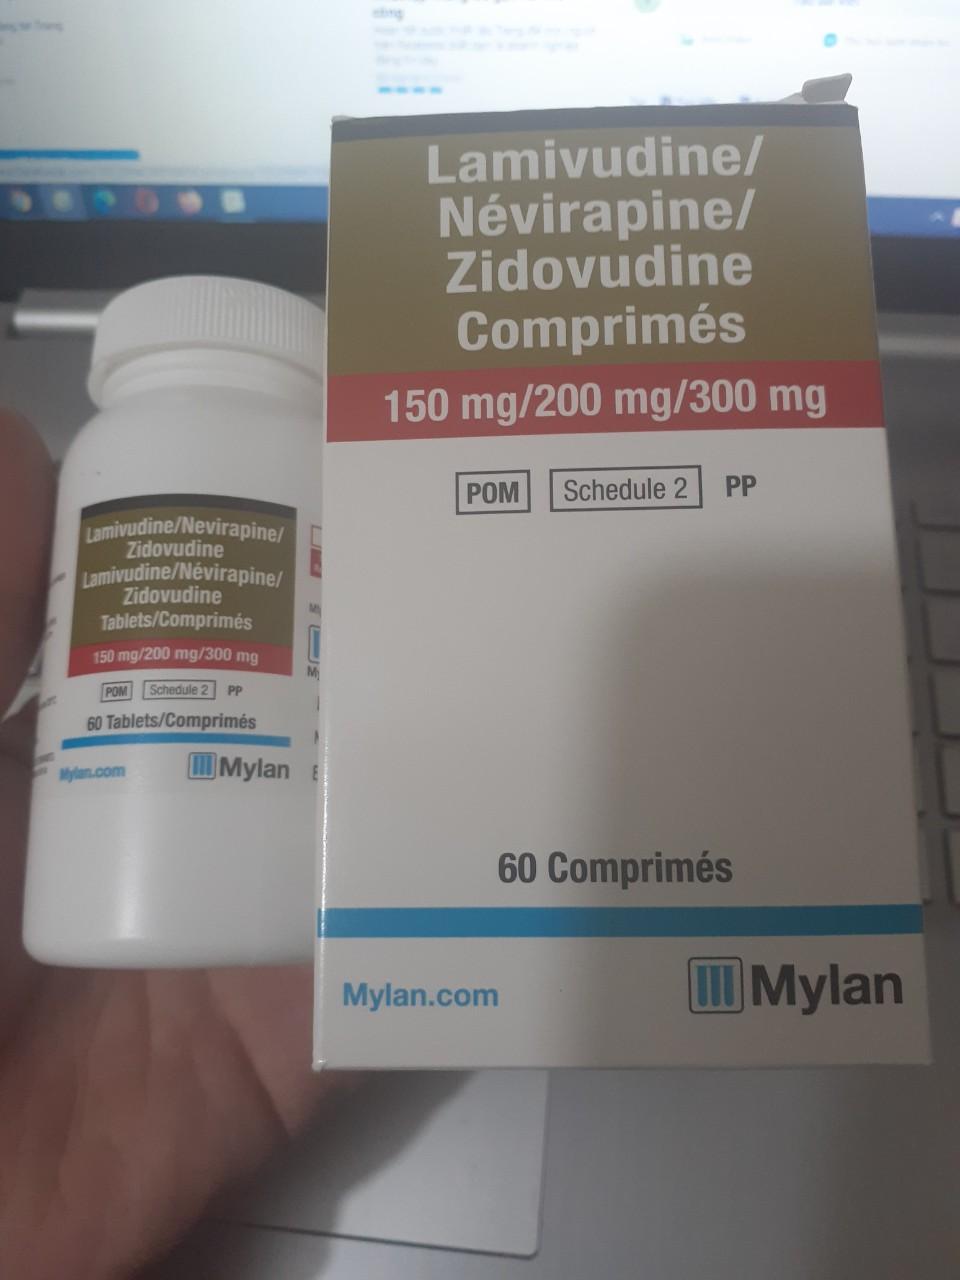 Thuoc-Lamivudine/Nevirapine/Zidovudine/150mg-200mg-300mg-02